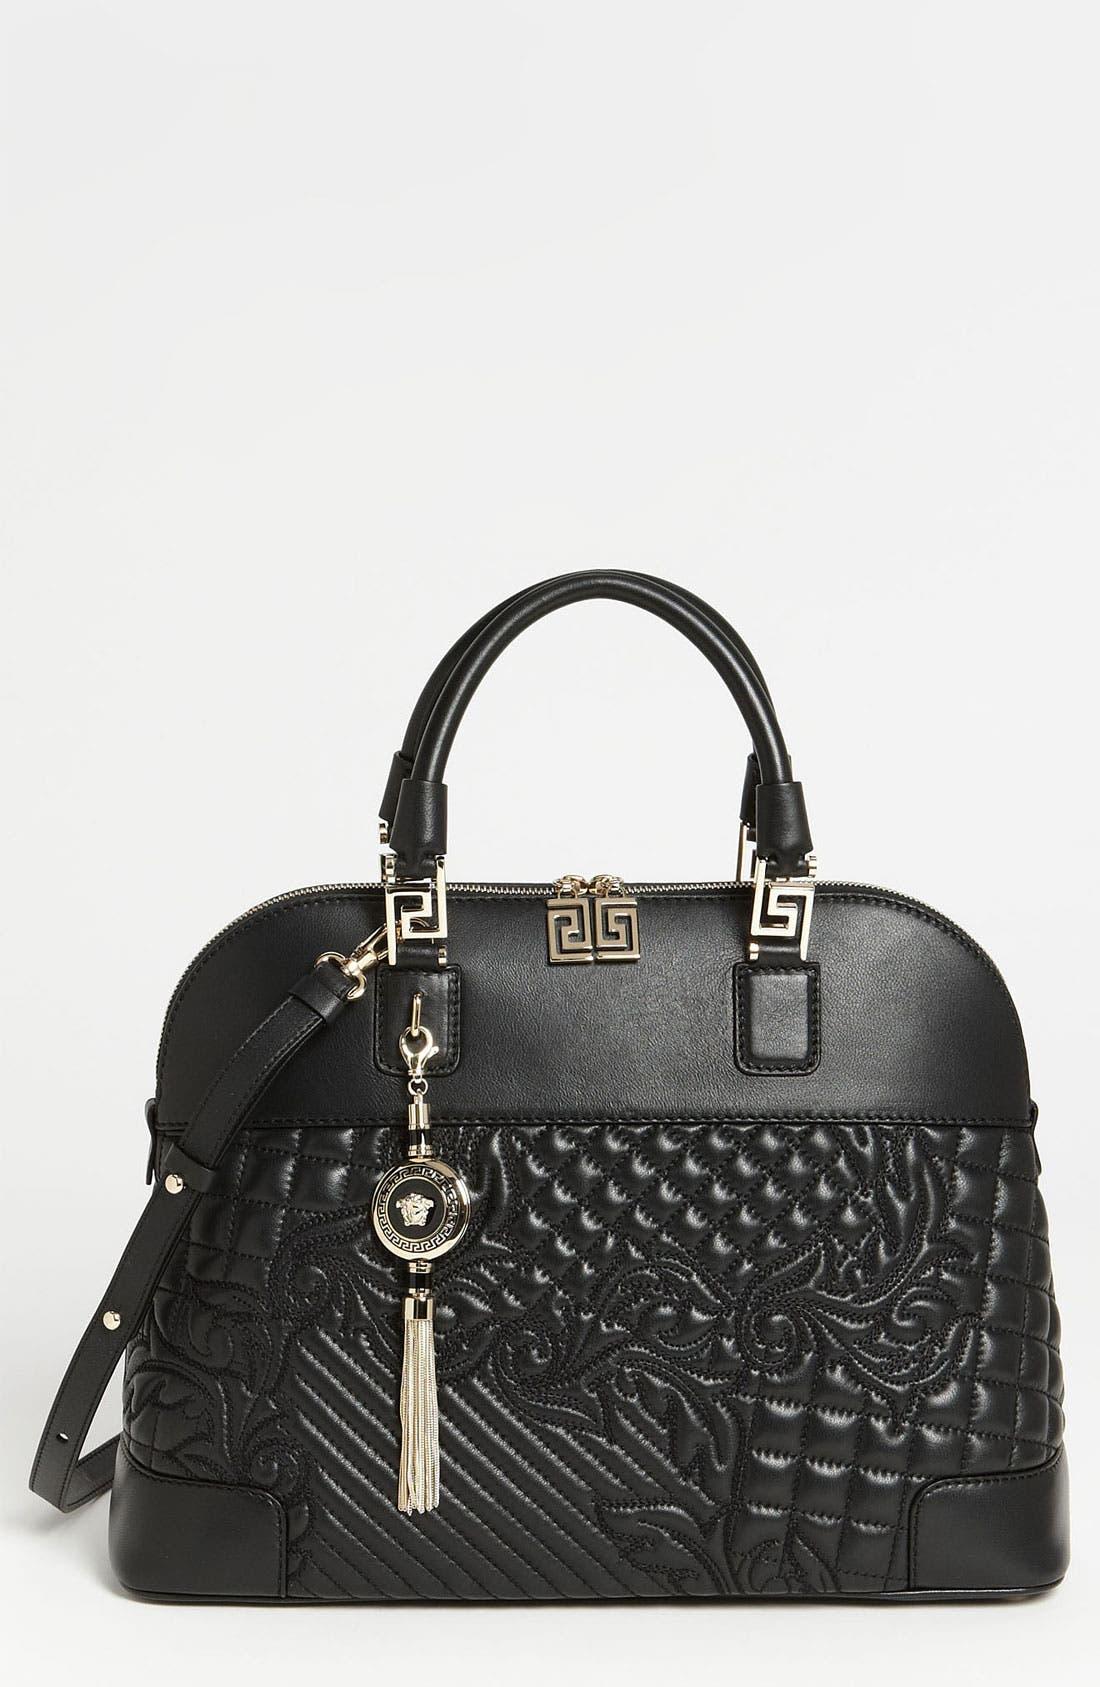 Main Image - Versace 'Vanitas' Embroidered Leather Satchel